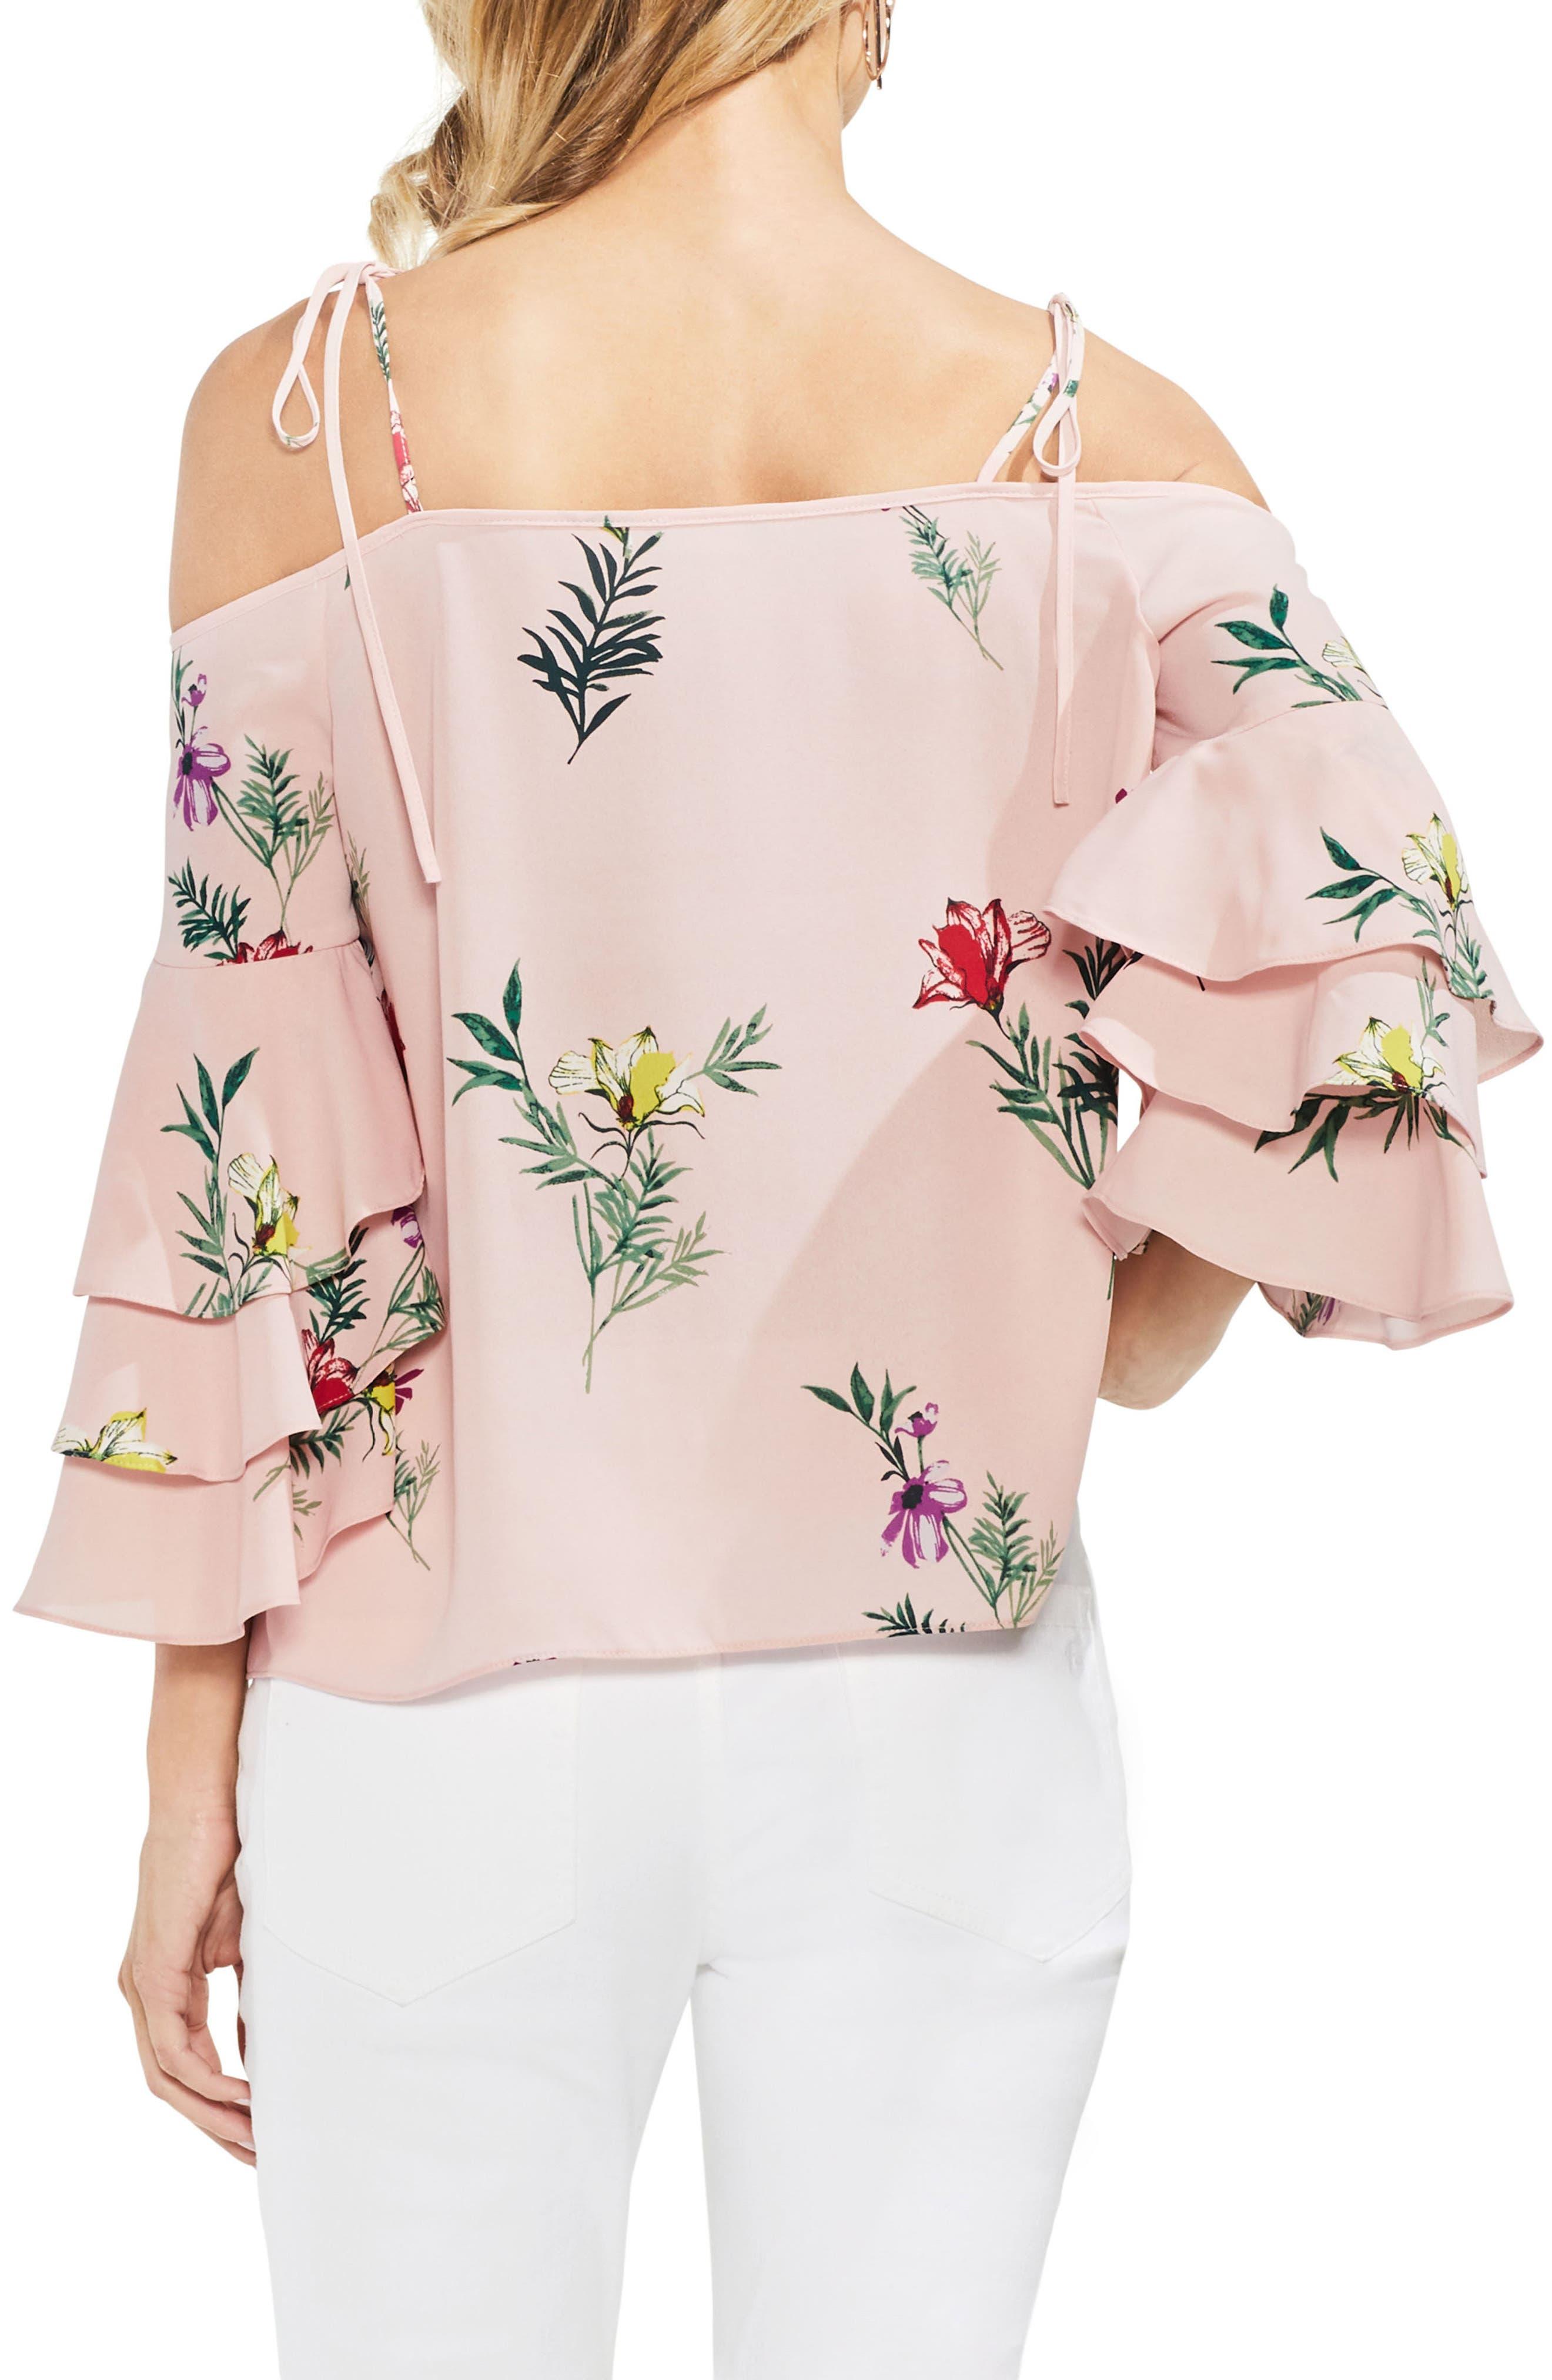 Tropical Garden Tie Shoulder Top,                             Alternate thumbnail 2, color,                             Eden Pink